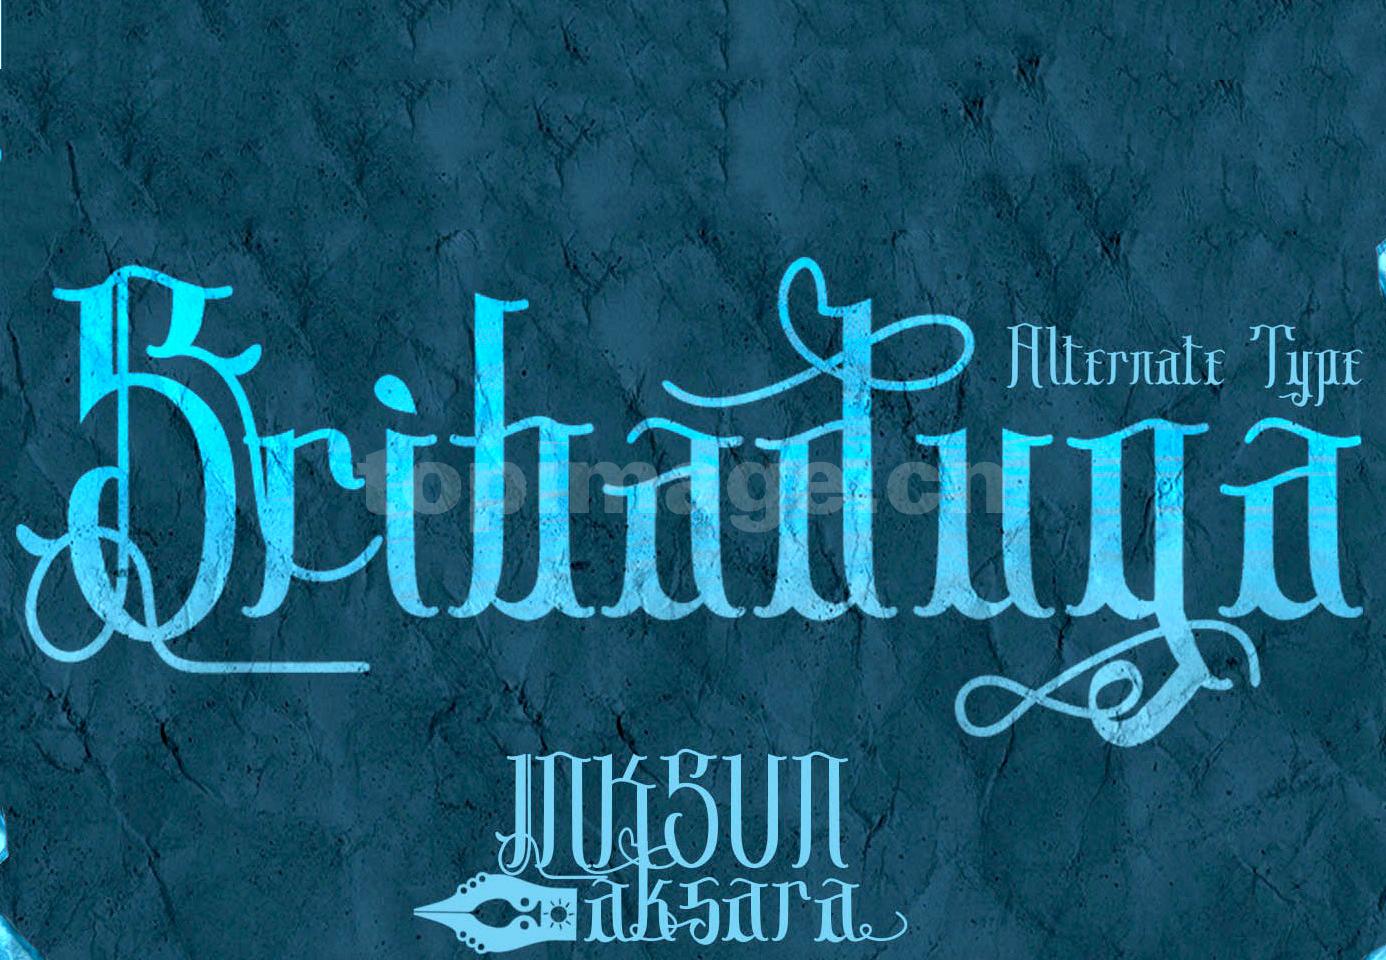 Sribaduga复古哥特连笔飘逸个性斑驳质感艺术英文字体下载